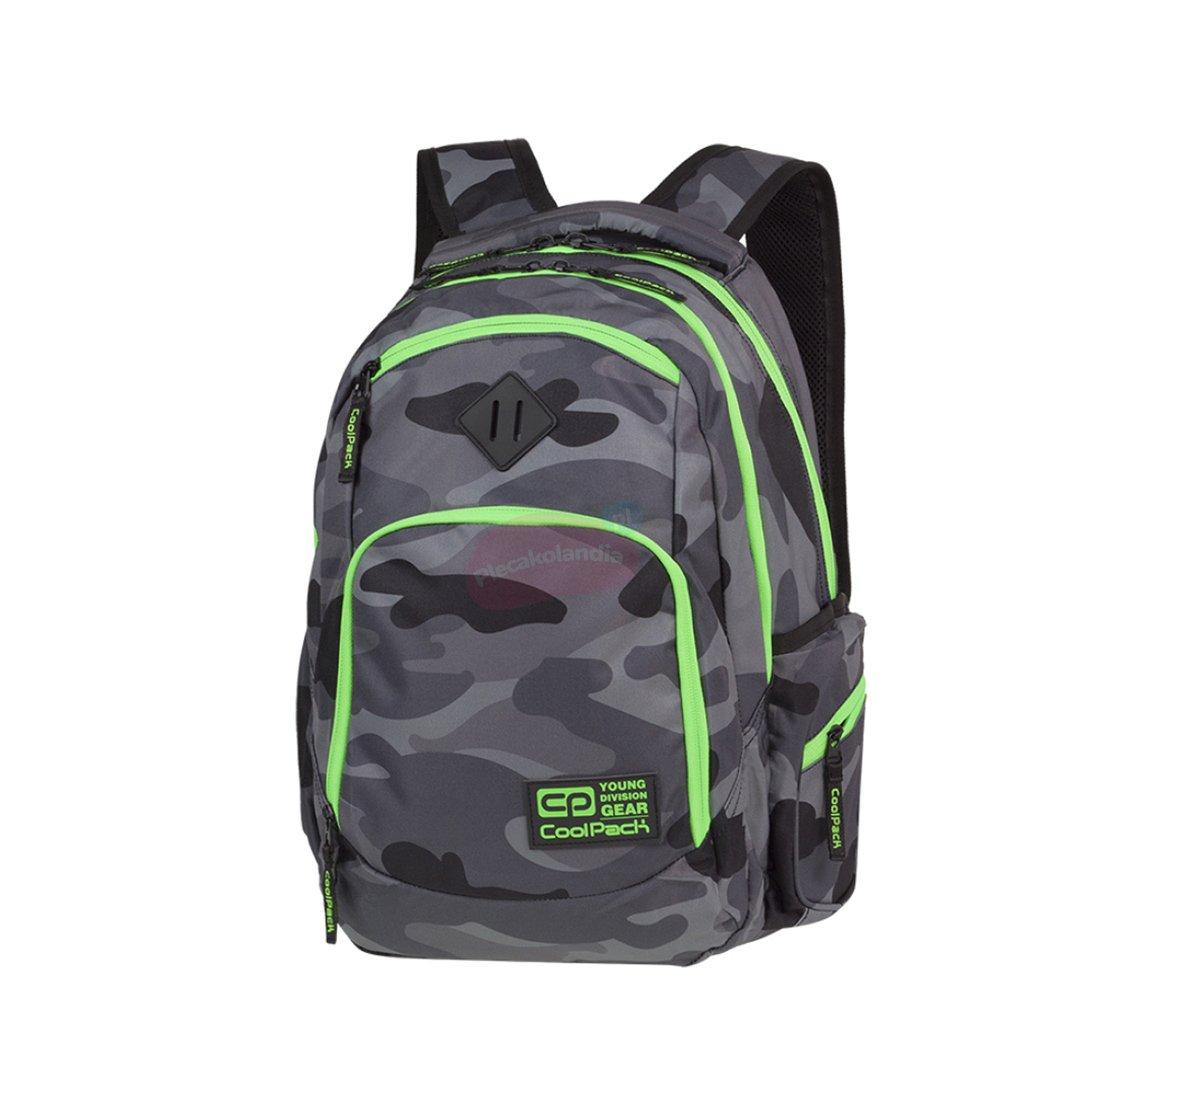 73f8c19772915 Plecak szkolny Coolpack Break 29L Camo Green Neon PTR 90377CP